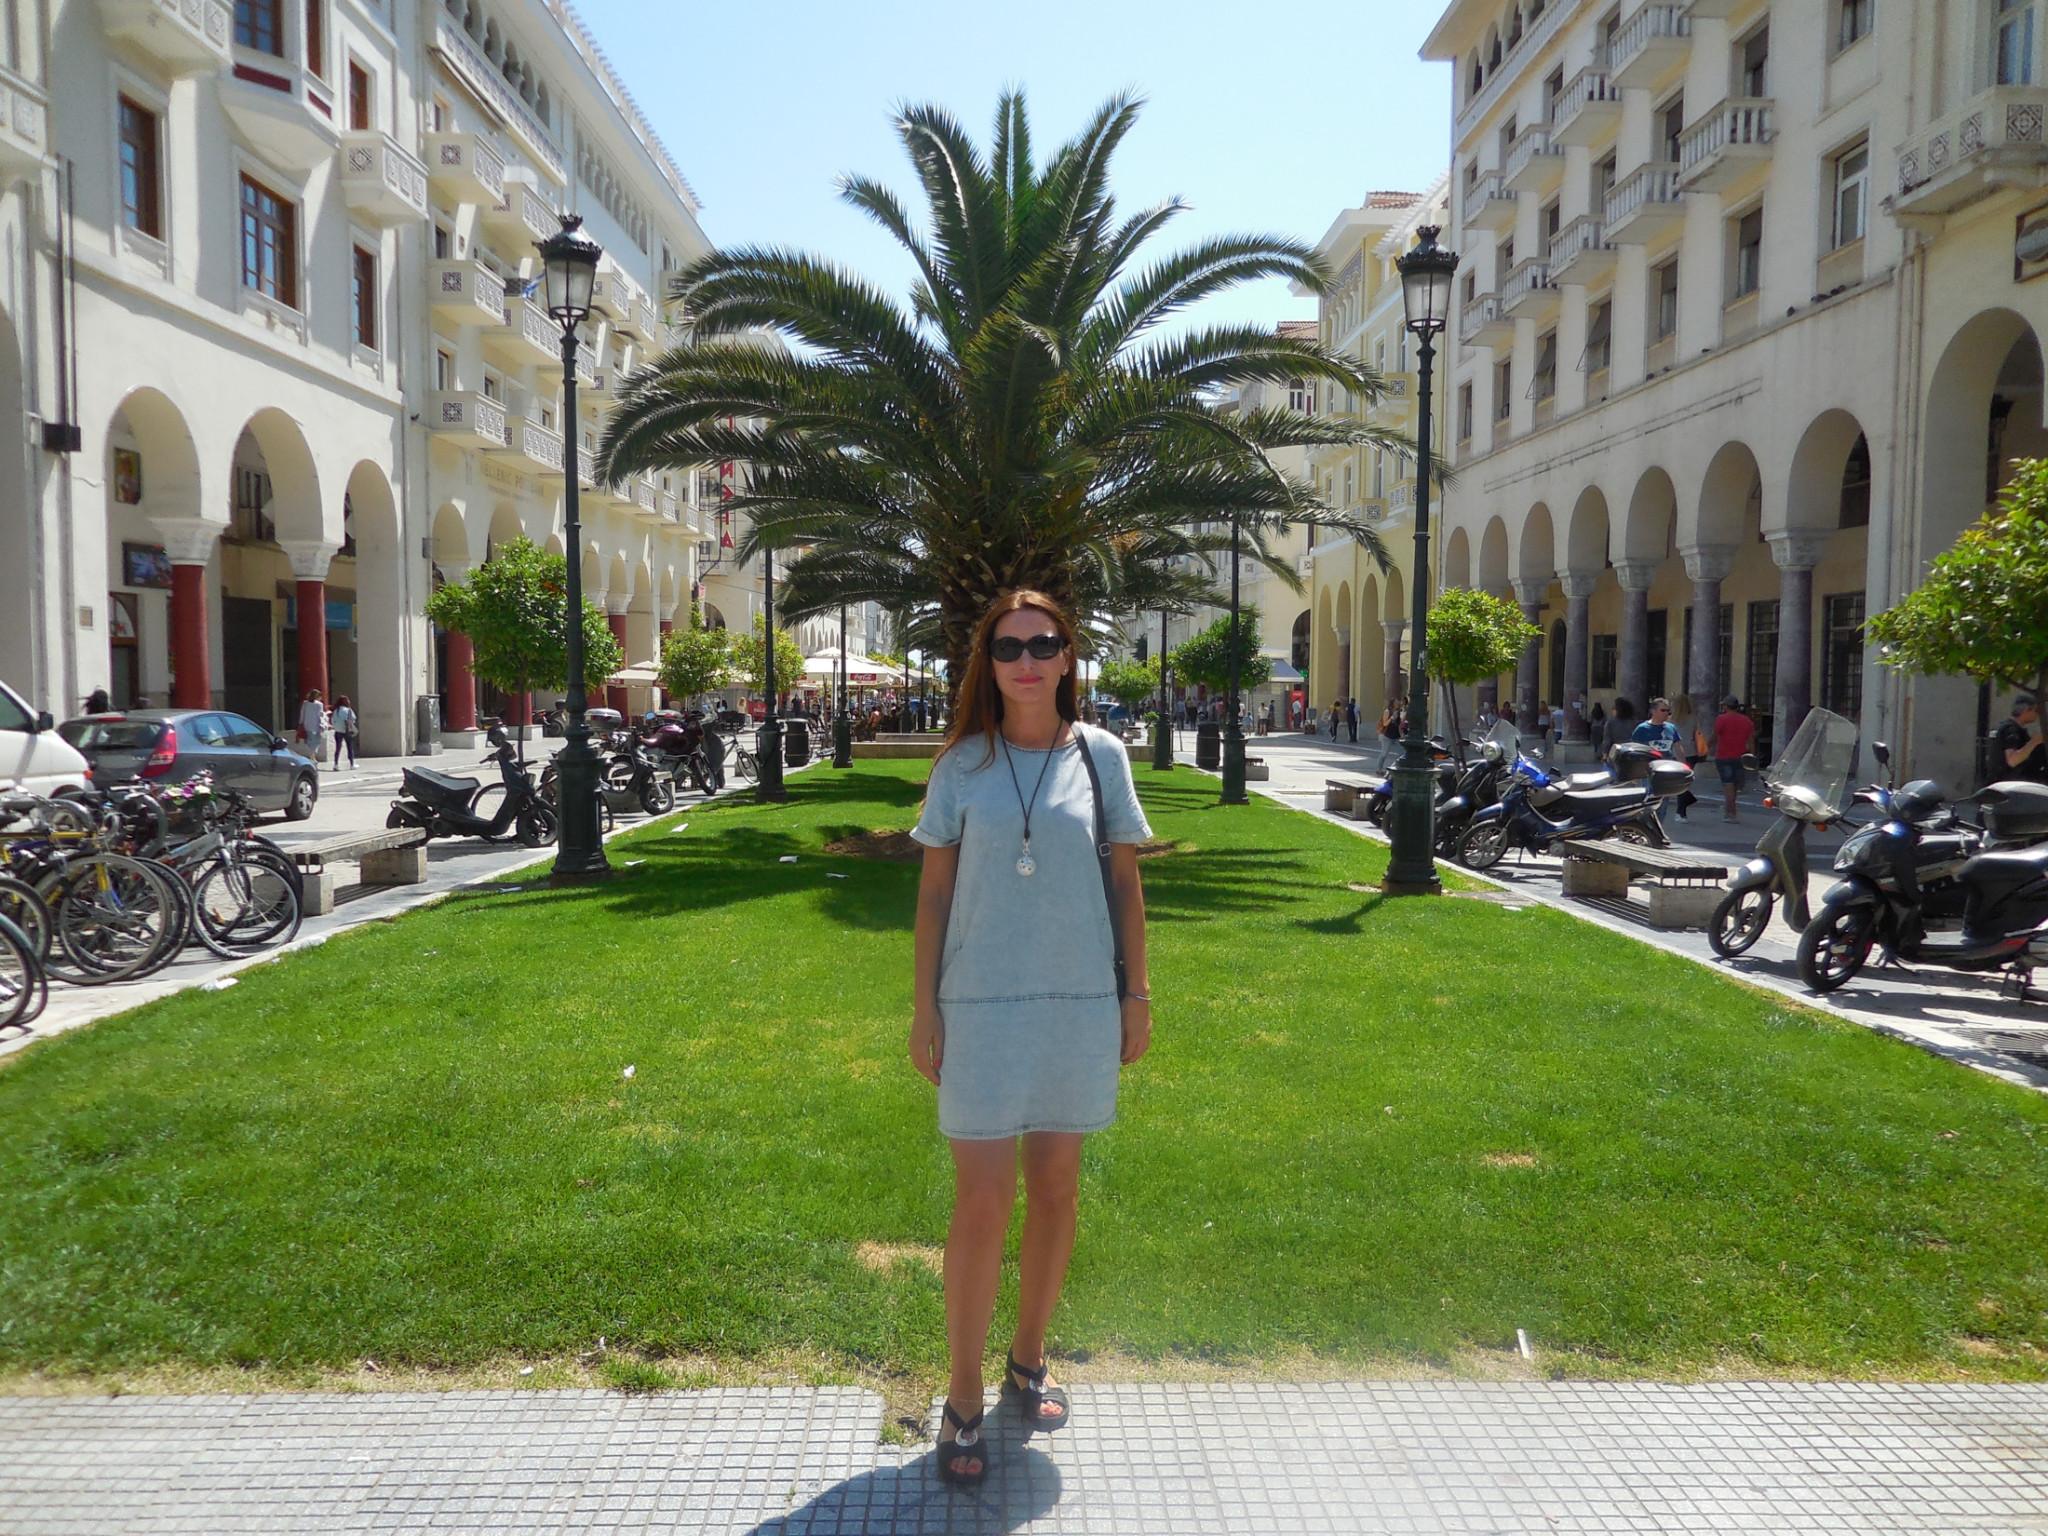 Saloniki miasto